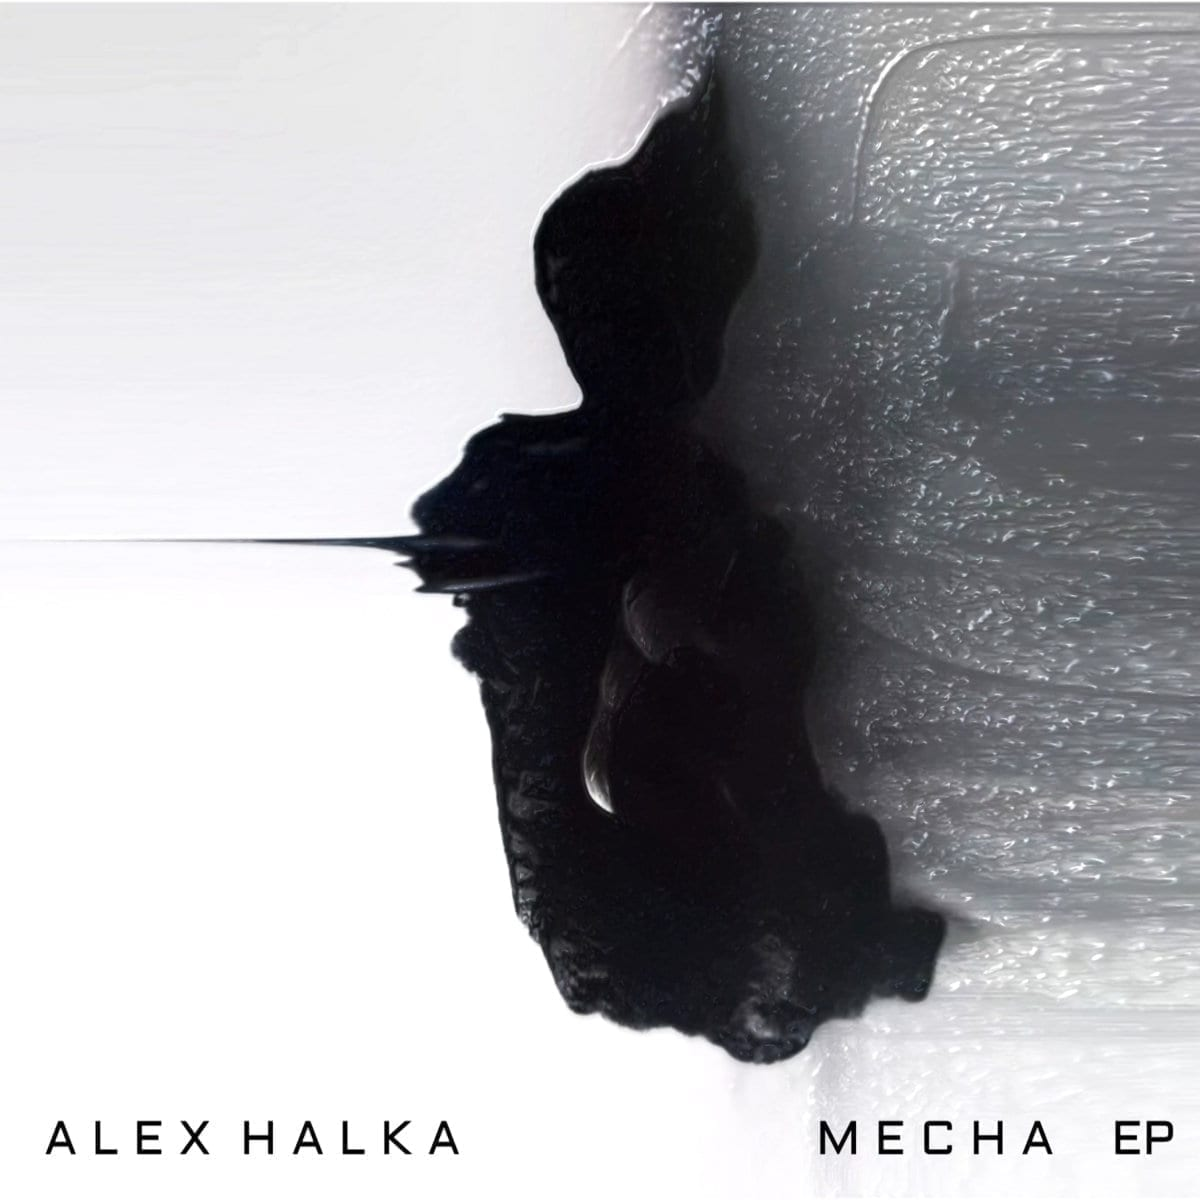 Alex Halka (w/ Vlaicu Golcea) - Mecha EP